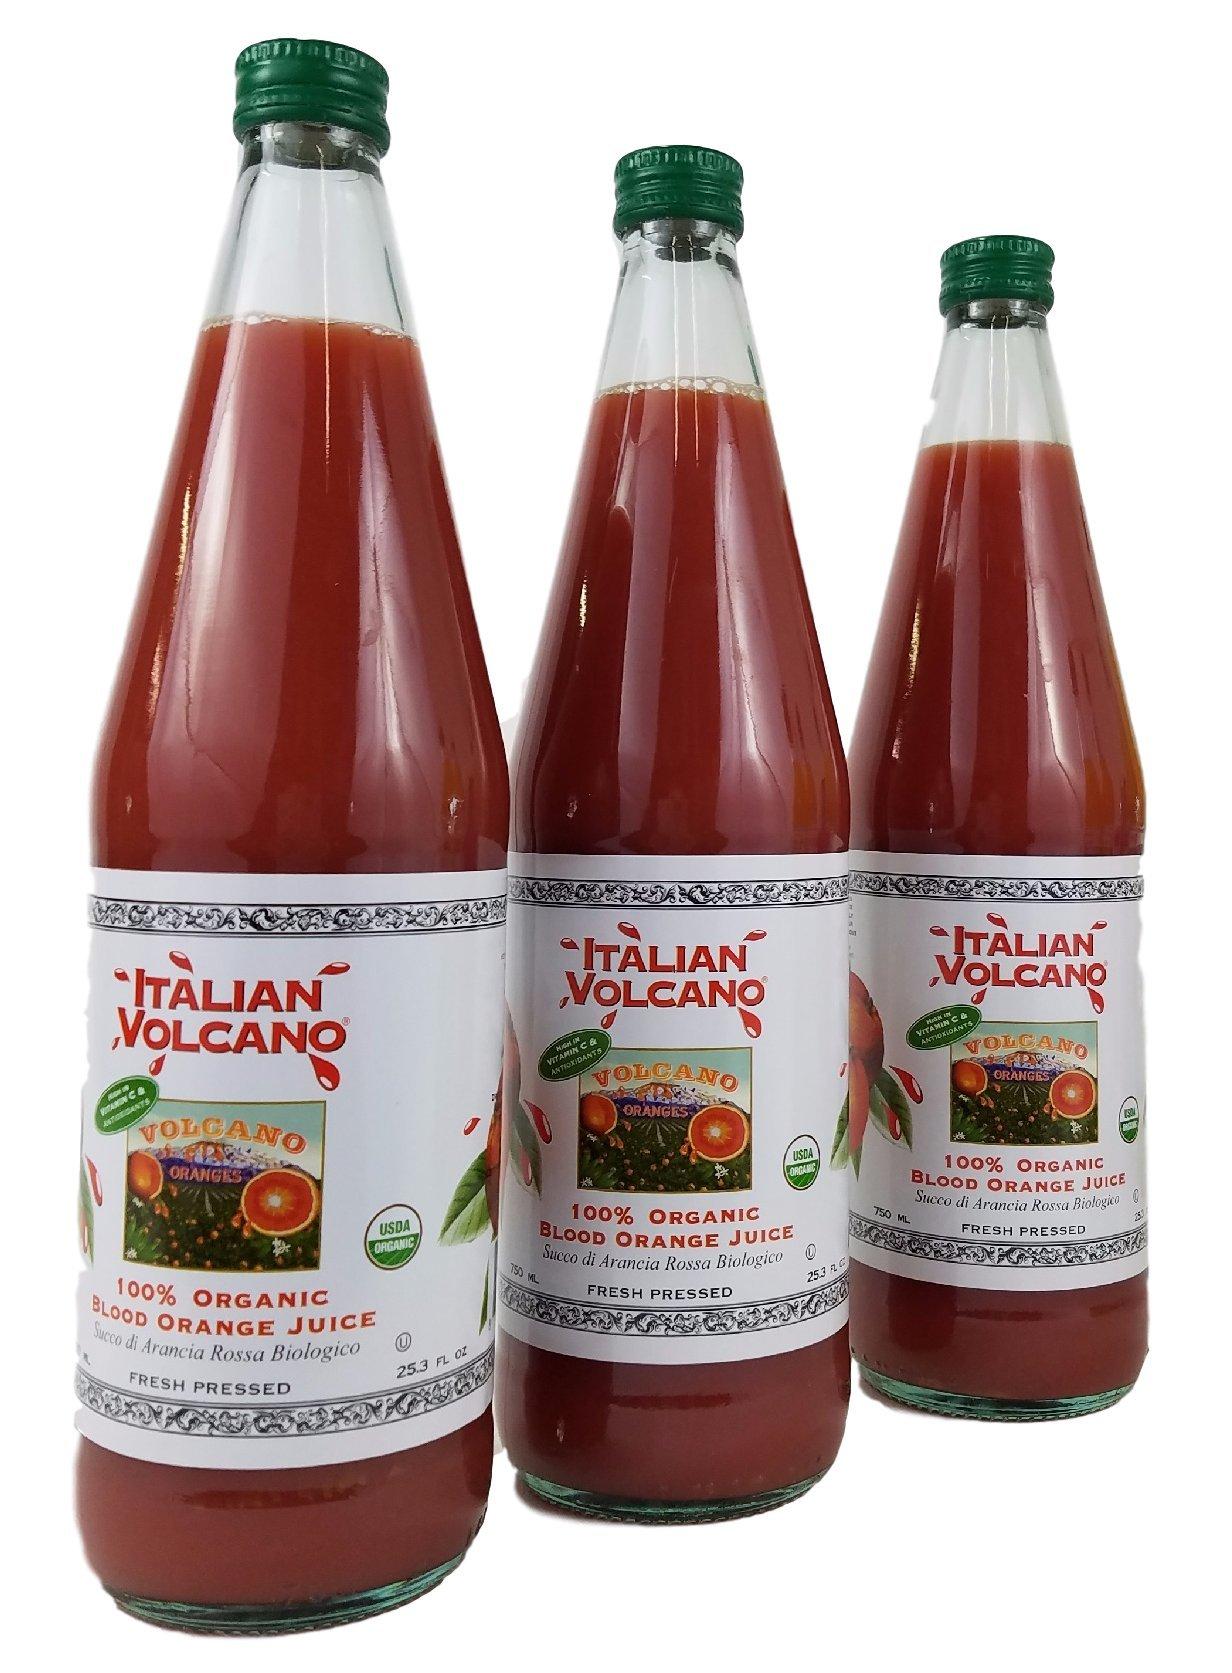 Juice Santal is one of the best